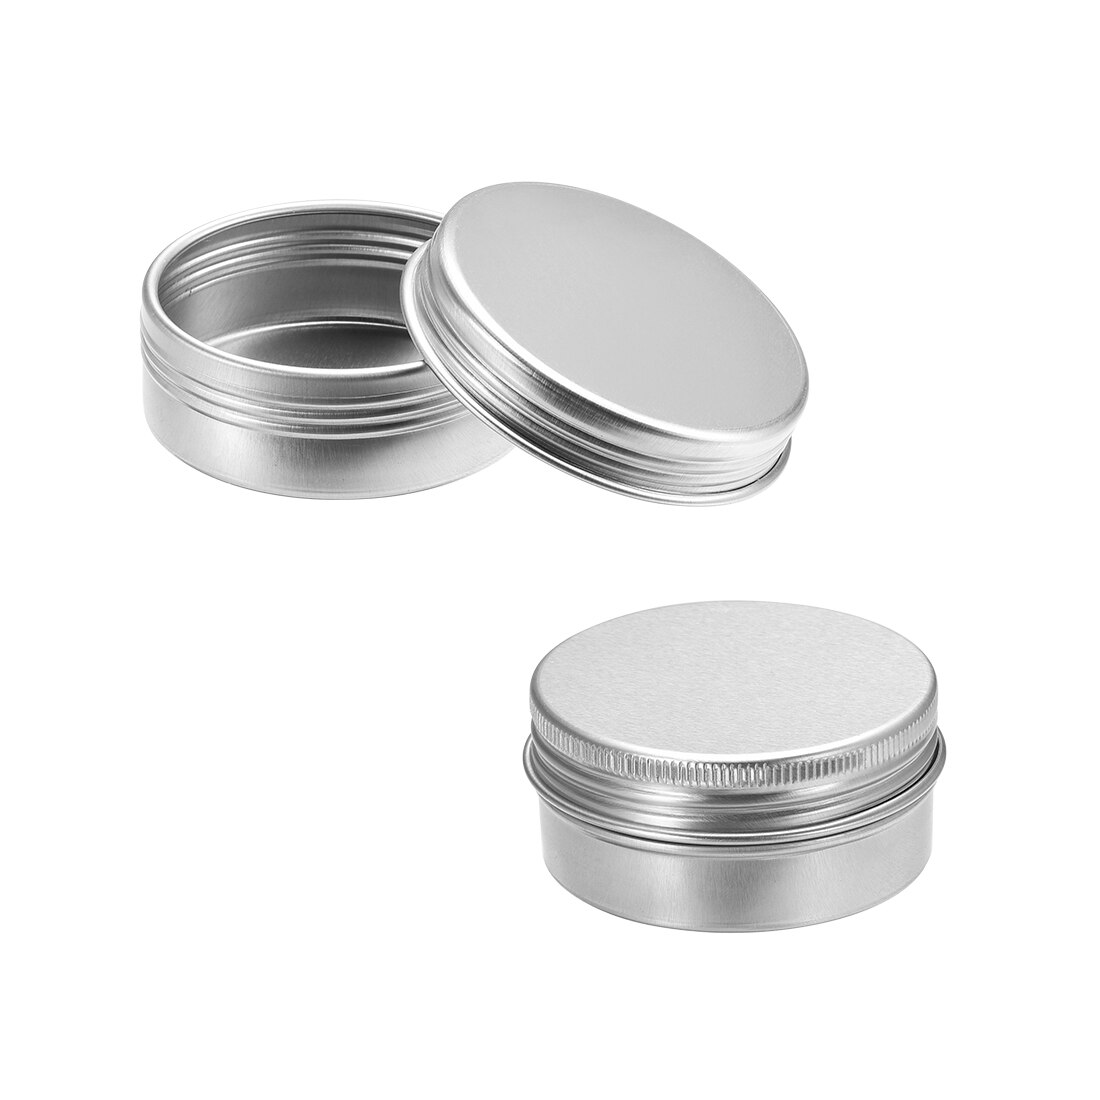 Latas redondas de aluminio uxcell, latas de hojalata para atornillar los recipientes con tapa de Metal para almacenar lociones hechas a mano, cremas para salsas, bálsamos, etc.